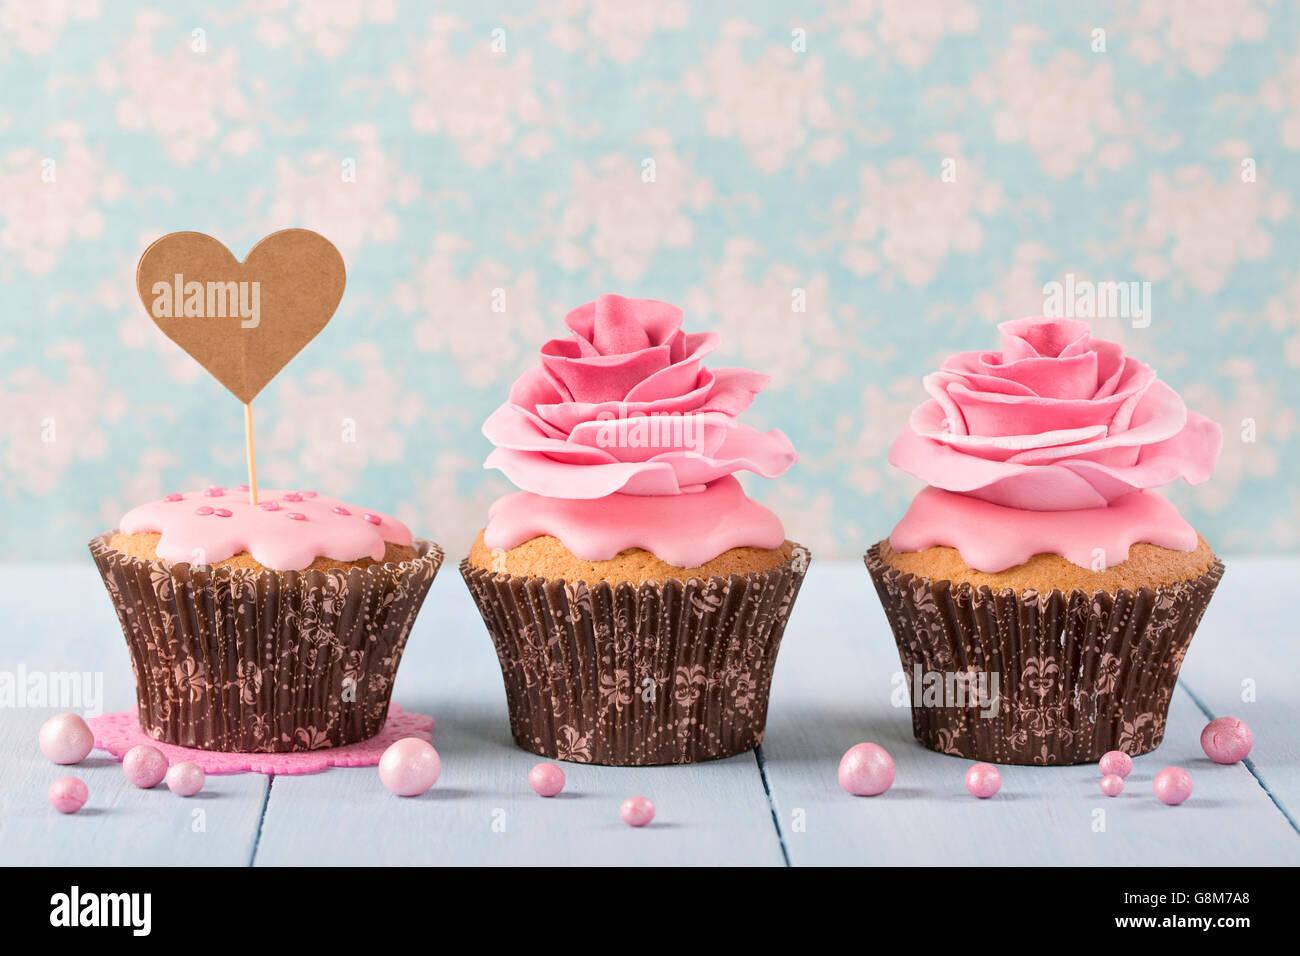 Cupcakes mit Herz Cakepick für text Stockbild